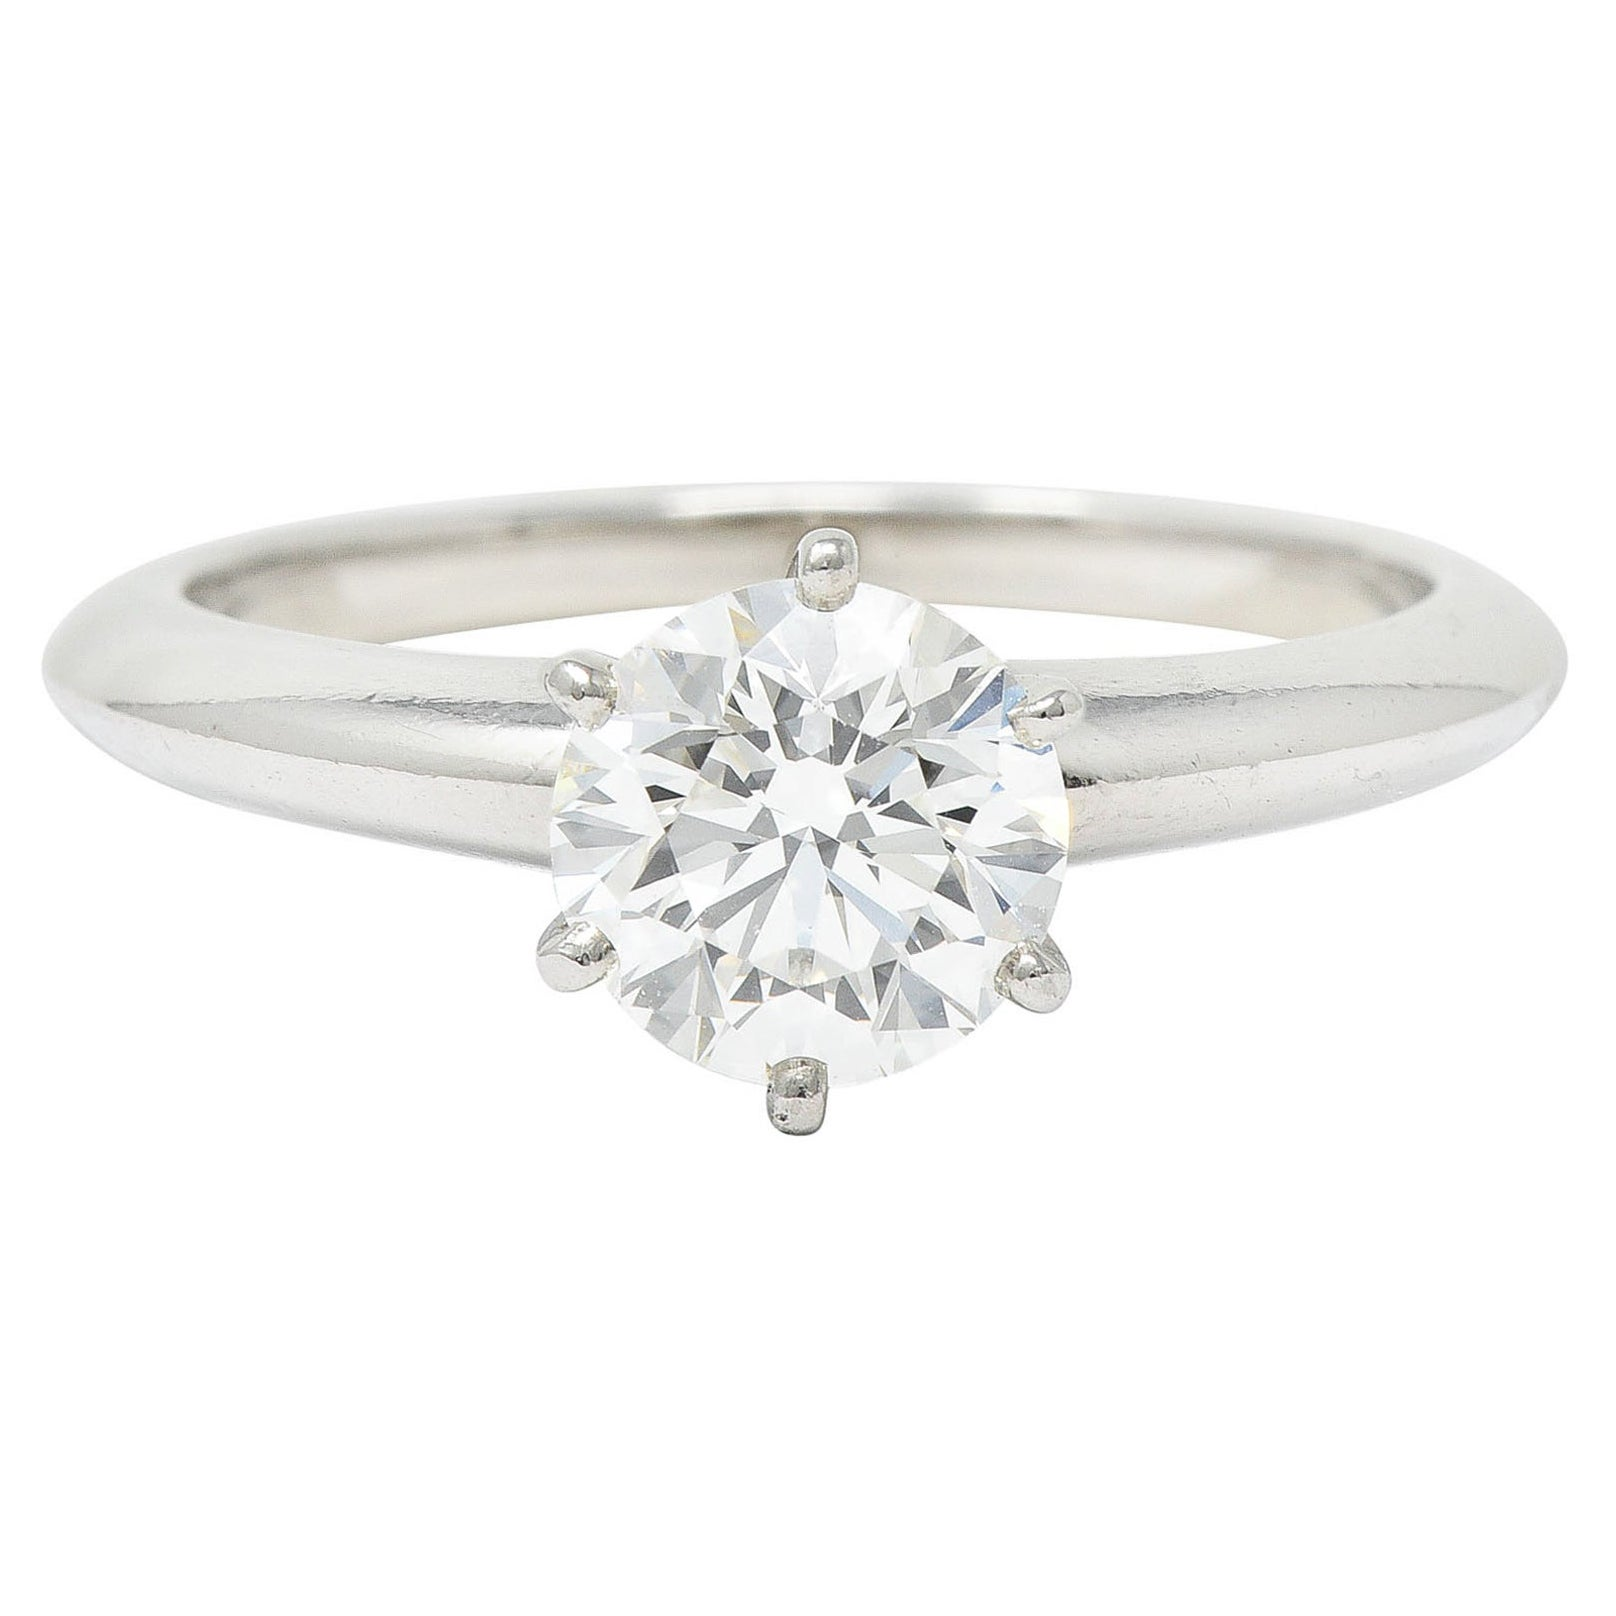 Tiffany & Co. 1.29 Carats Diamond Platinum Solitaire Engagement Ring